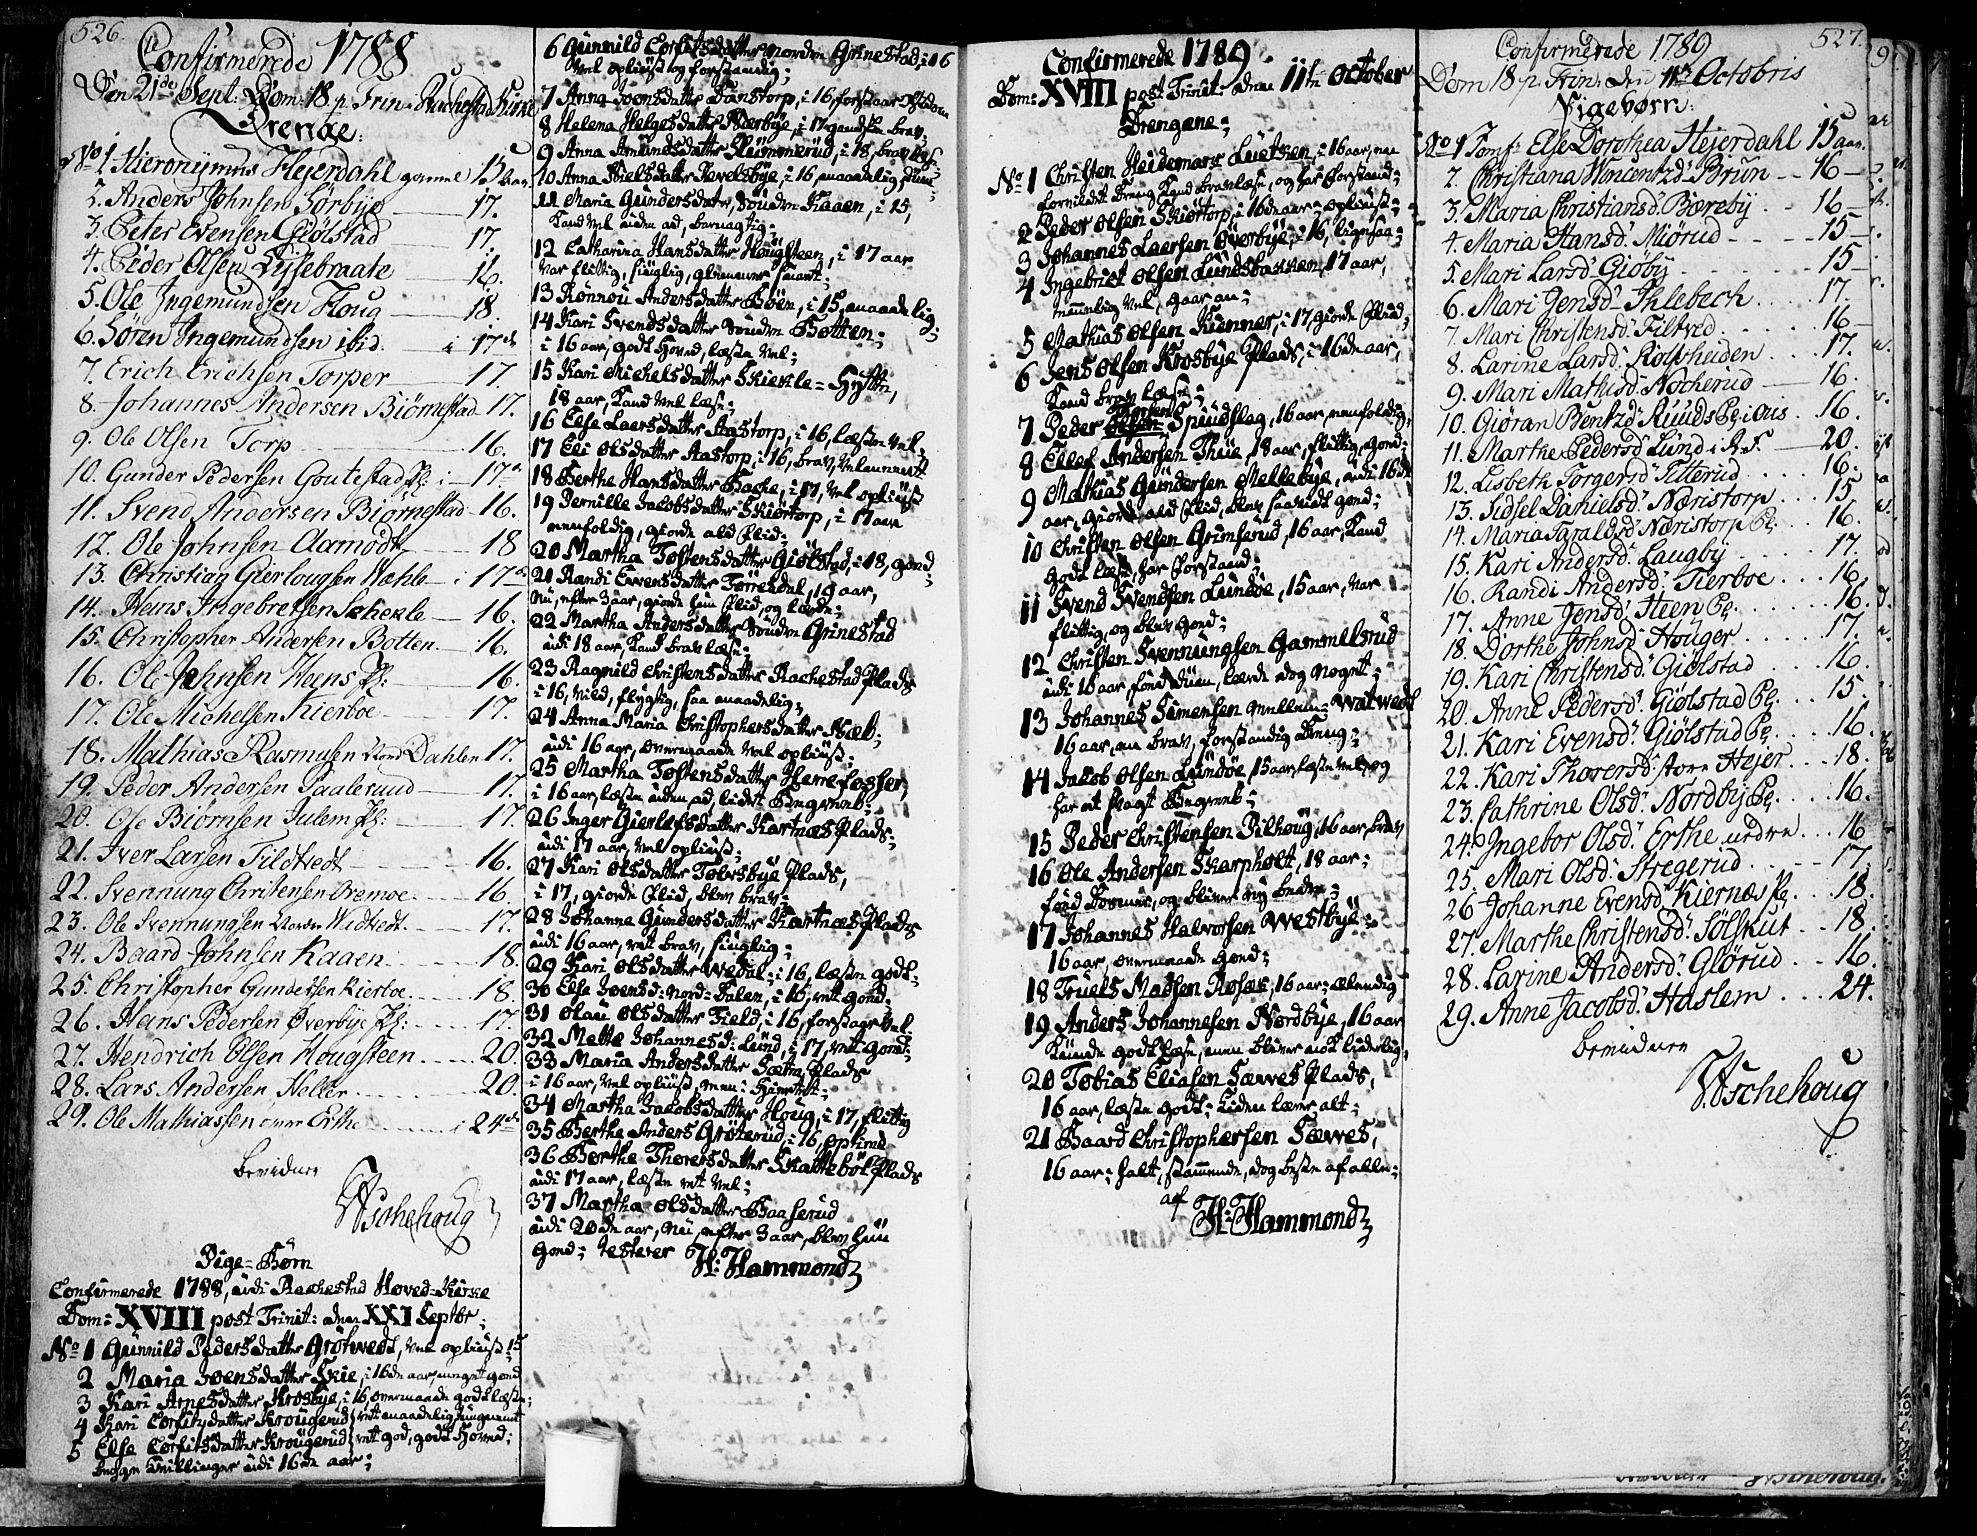 SAO, Rakkestad prestekontor Kirkebøker, F/Fa/L0005: Ministerialbok nr. I 5, 1784-1814, s. 526-527